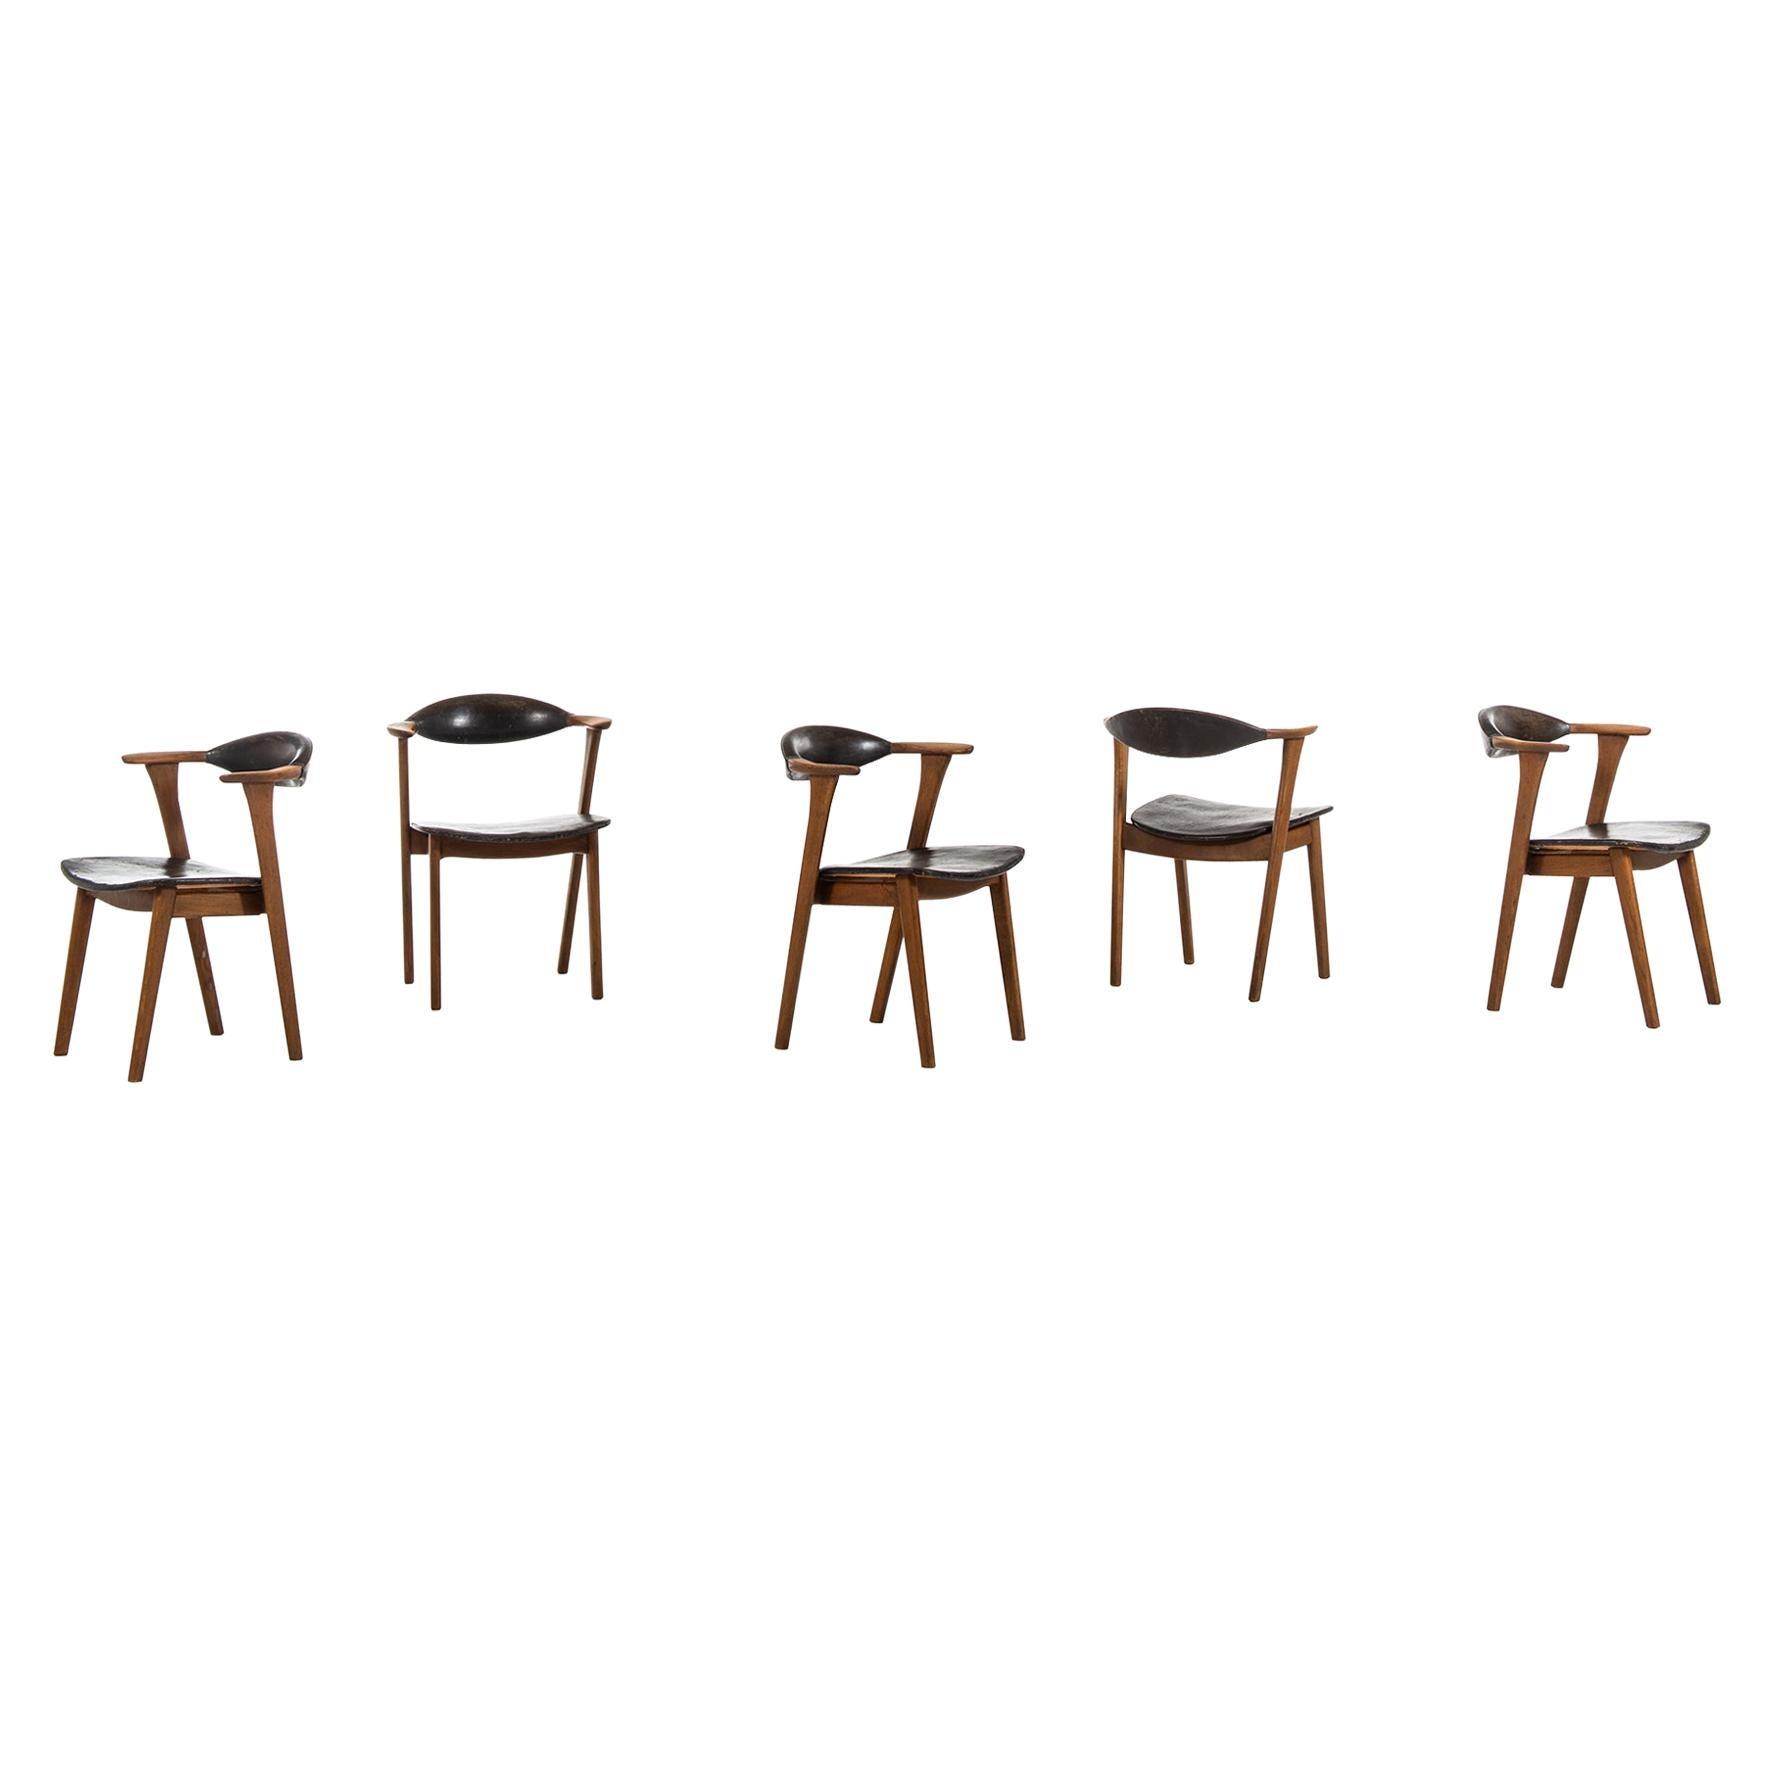 Erik Kirkegaard Armchairs / Dining Chairs B Høng Møbelfabrik in Denmark